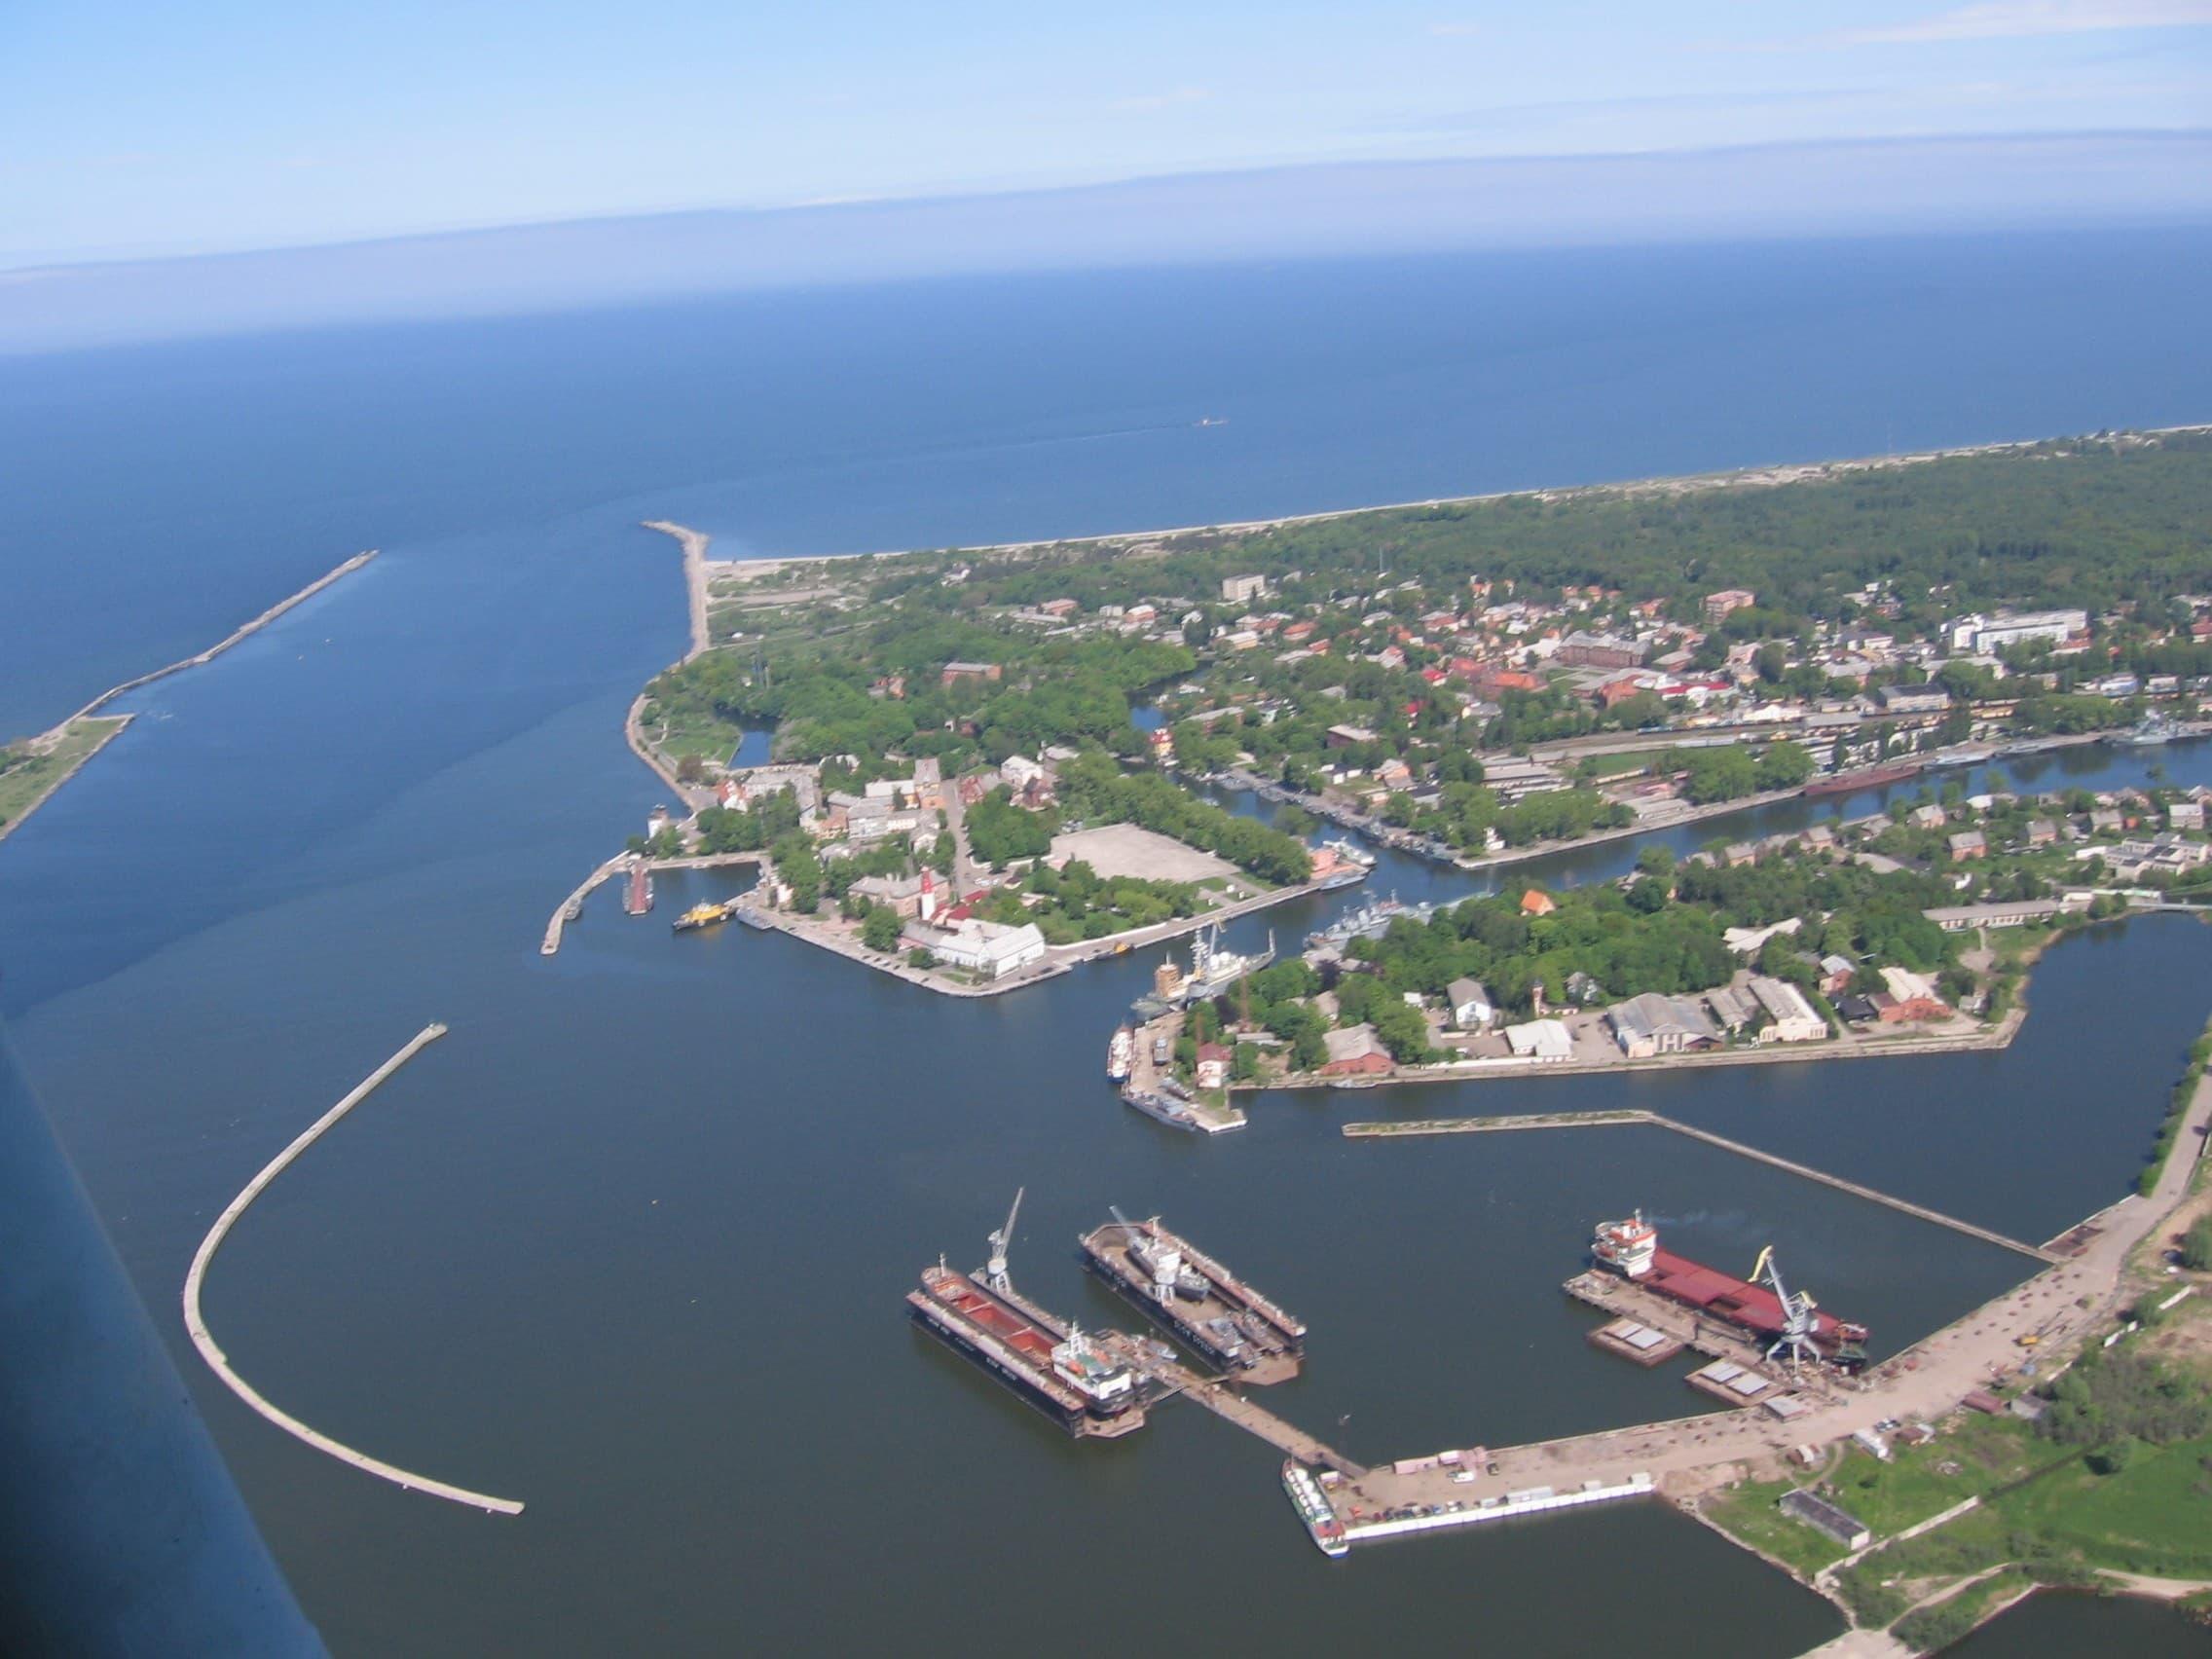 фото города балтийска количество